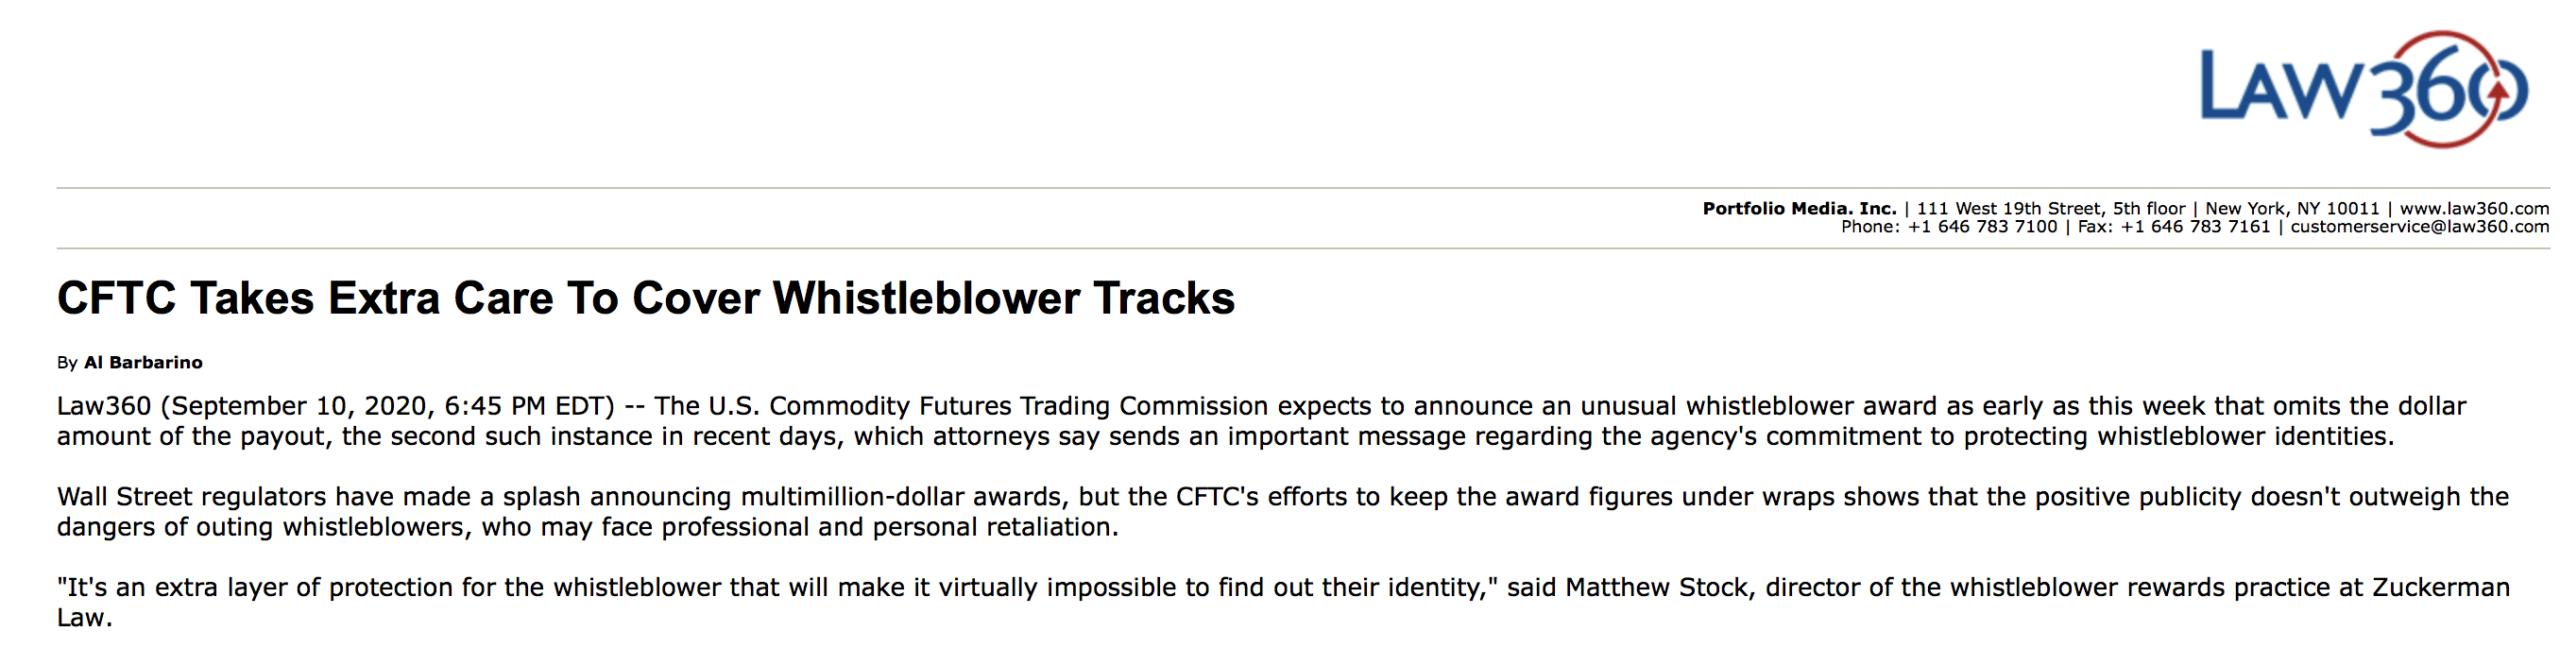 CFTC whistleblower lawyers